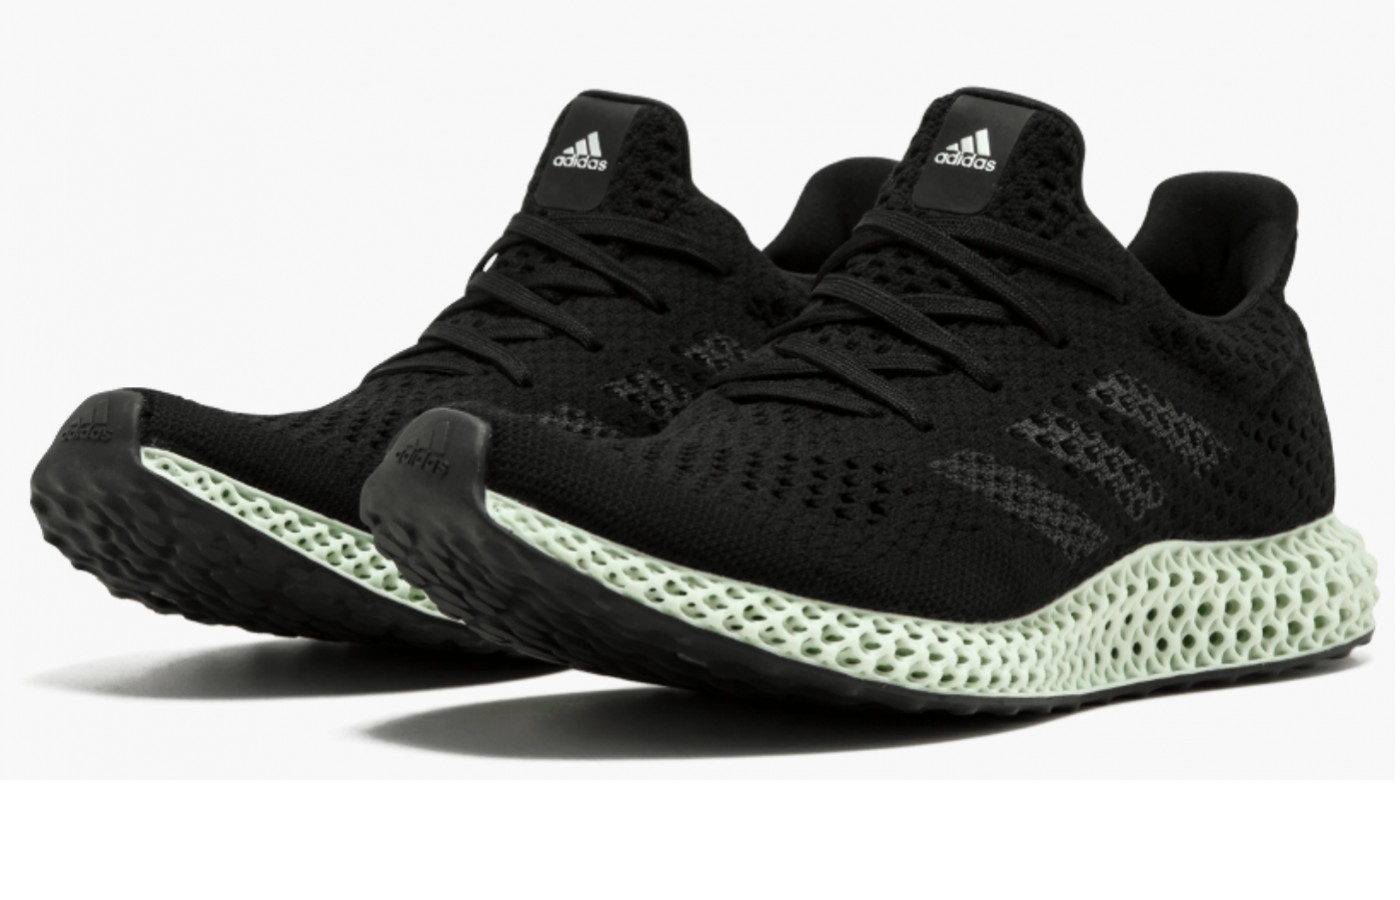 Adidas Futurecraft 4D Pair